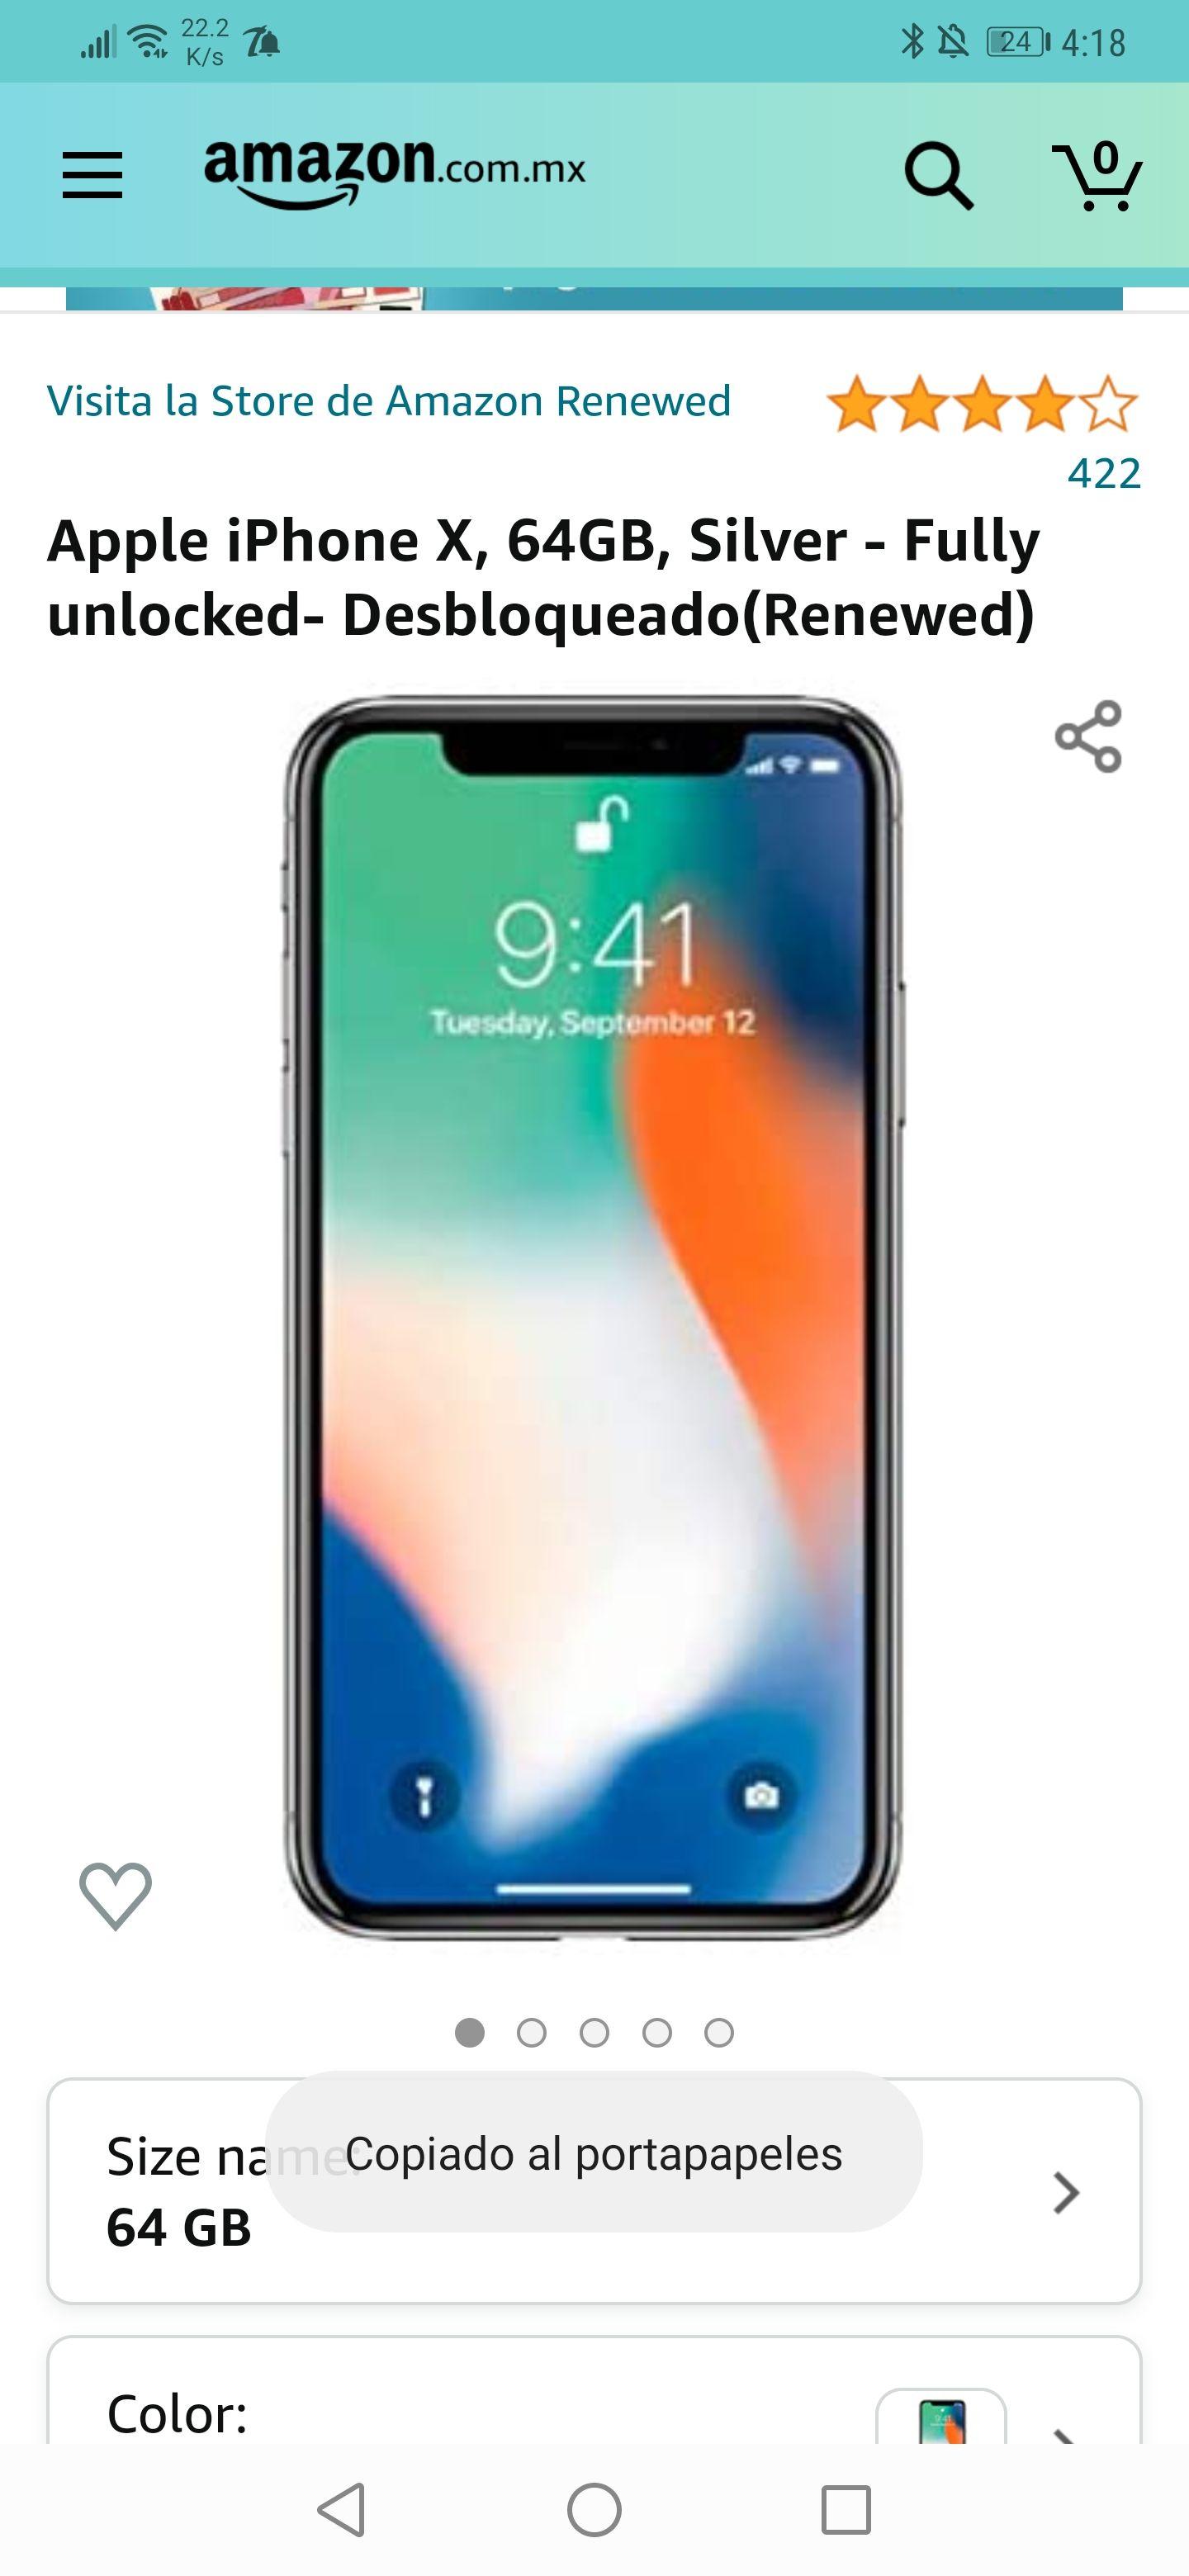 Amazon : Apple iPhone X, 64GB, Silver - Desbloqueado(Renewed)